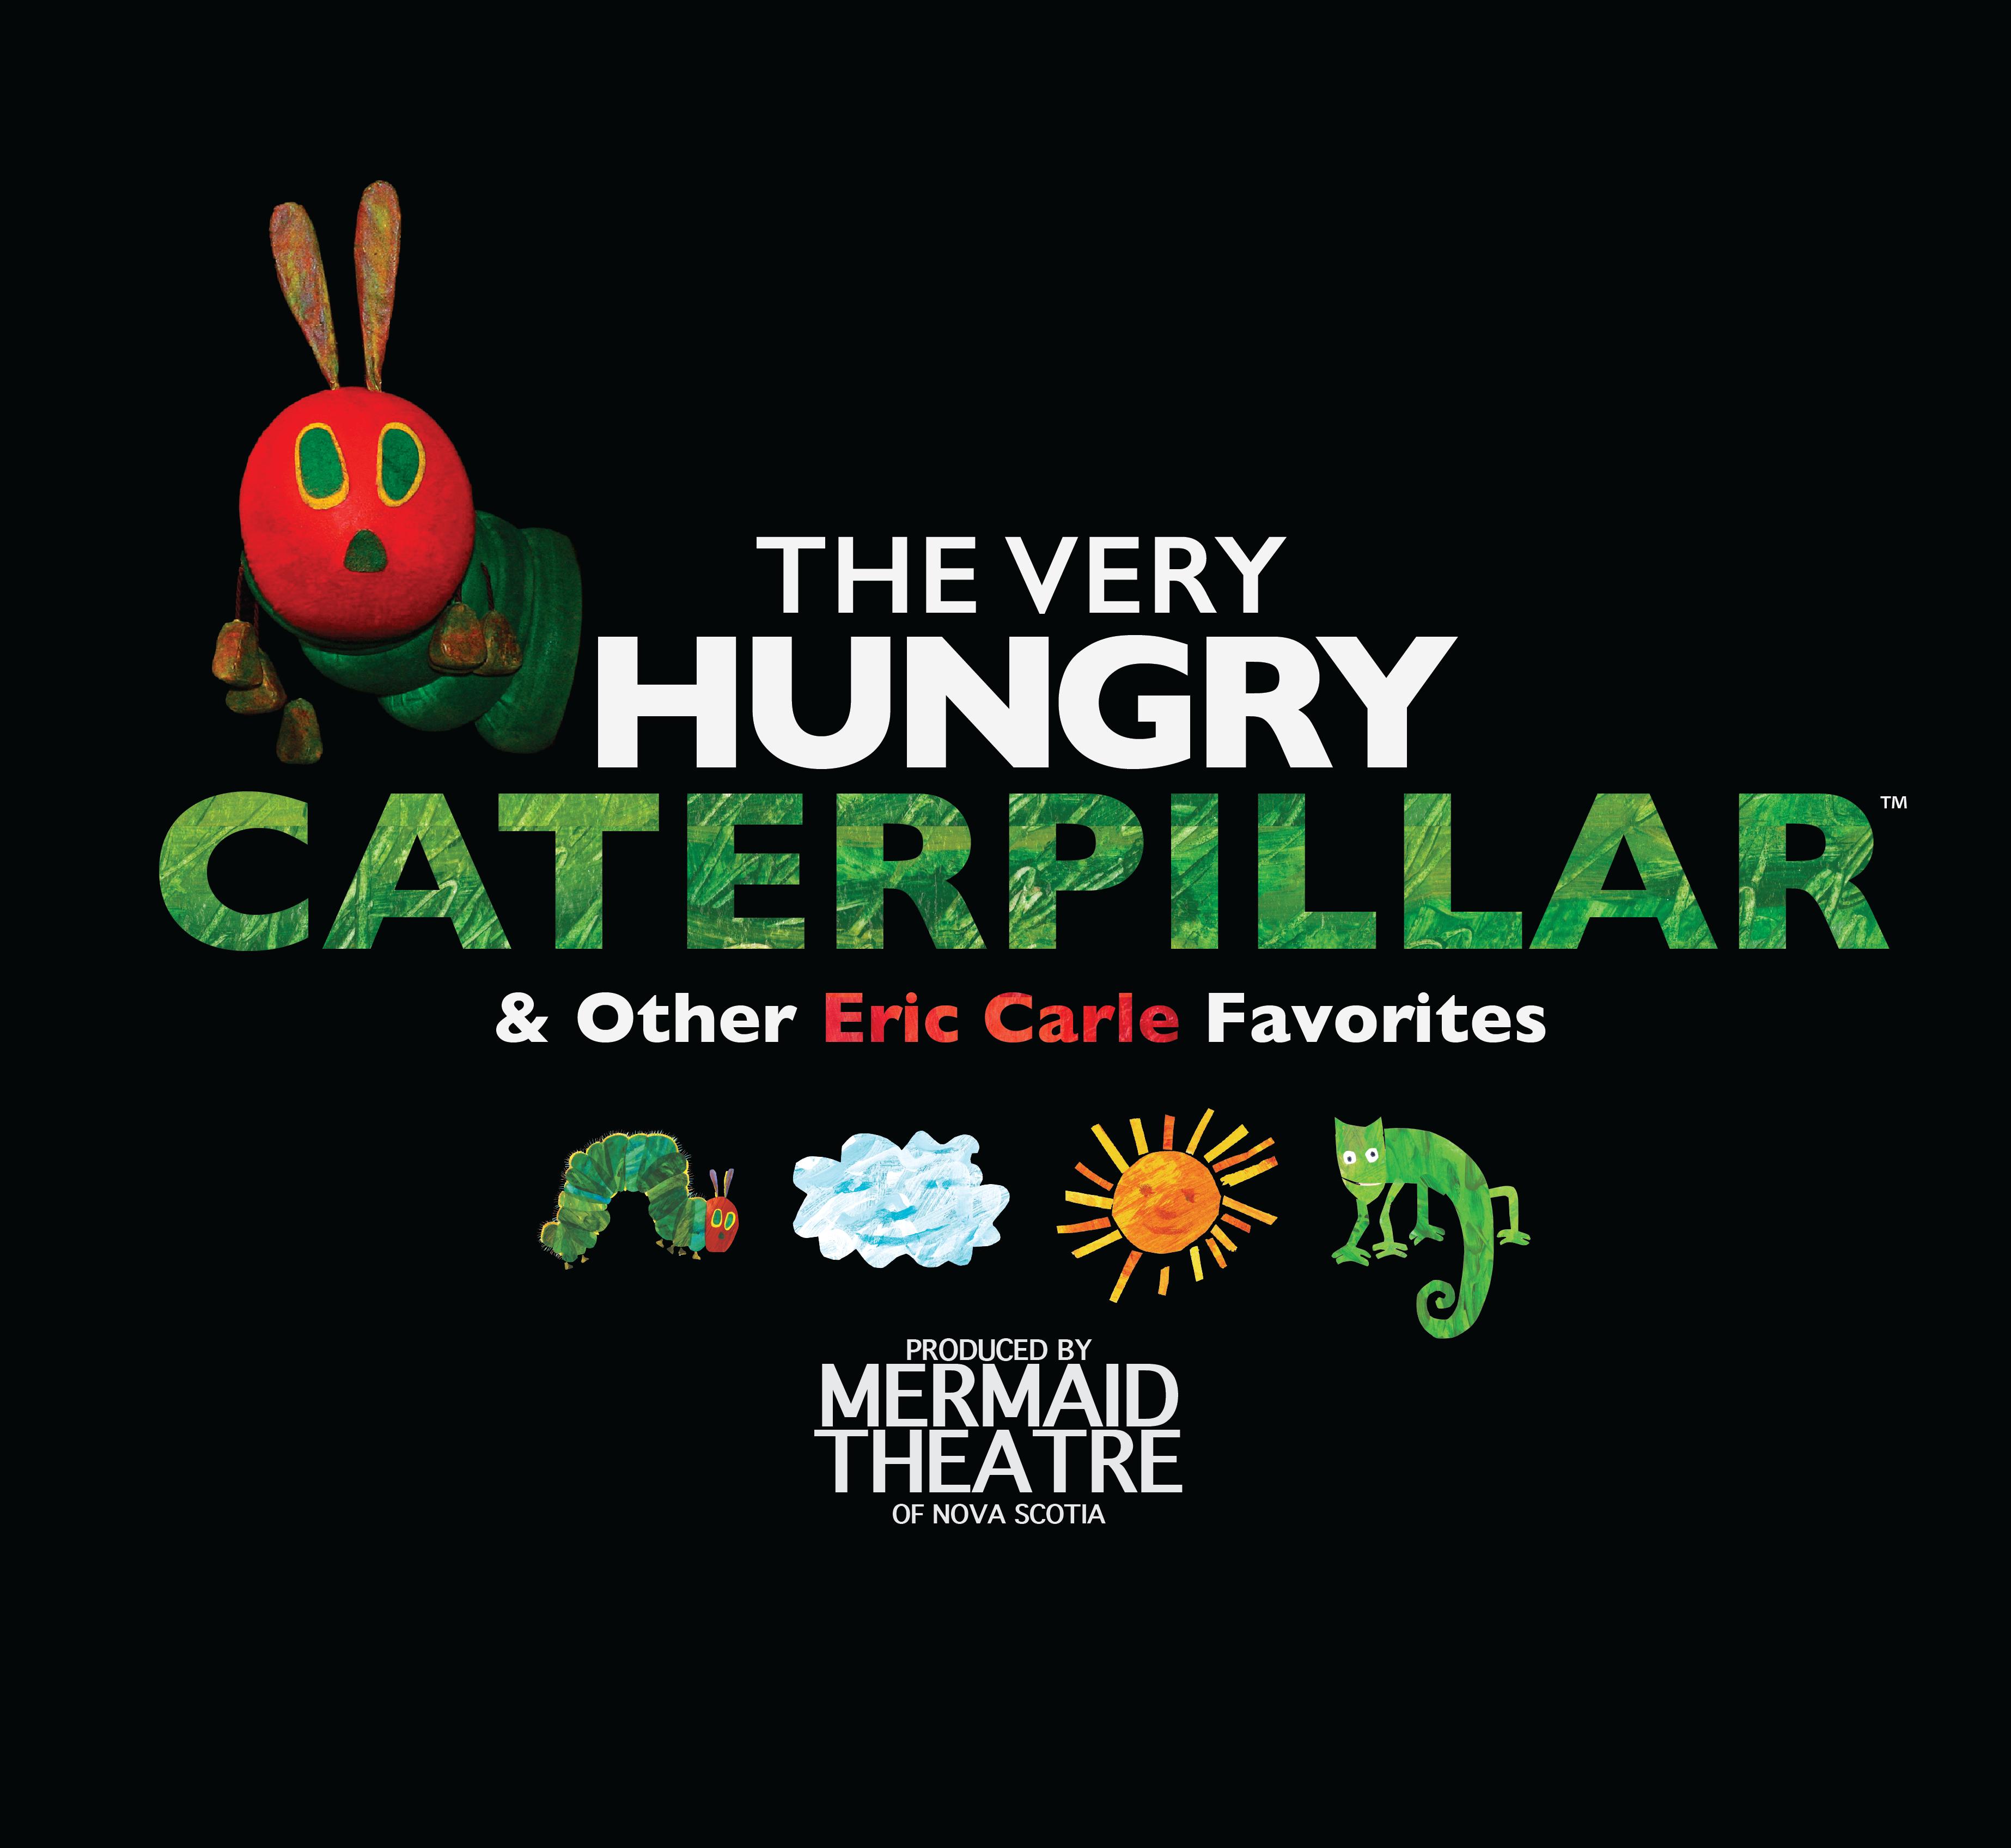 The Very Hungry Caterpillar logo